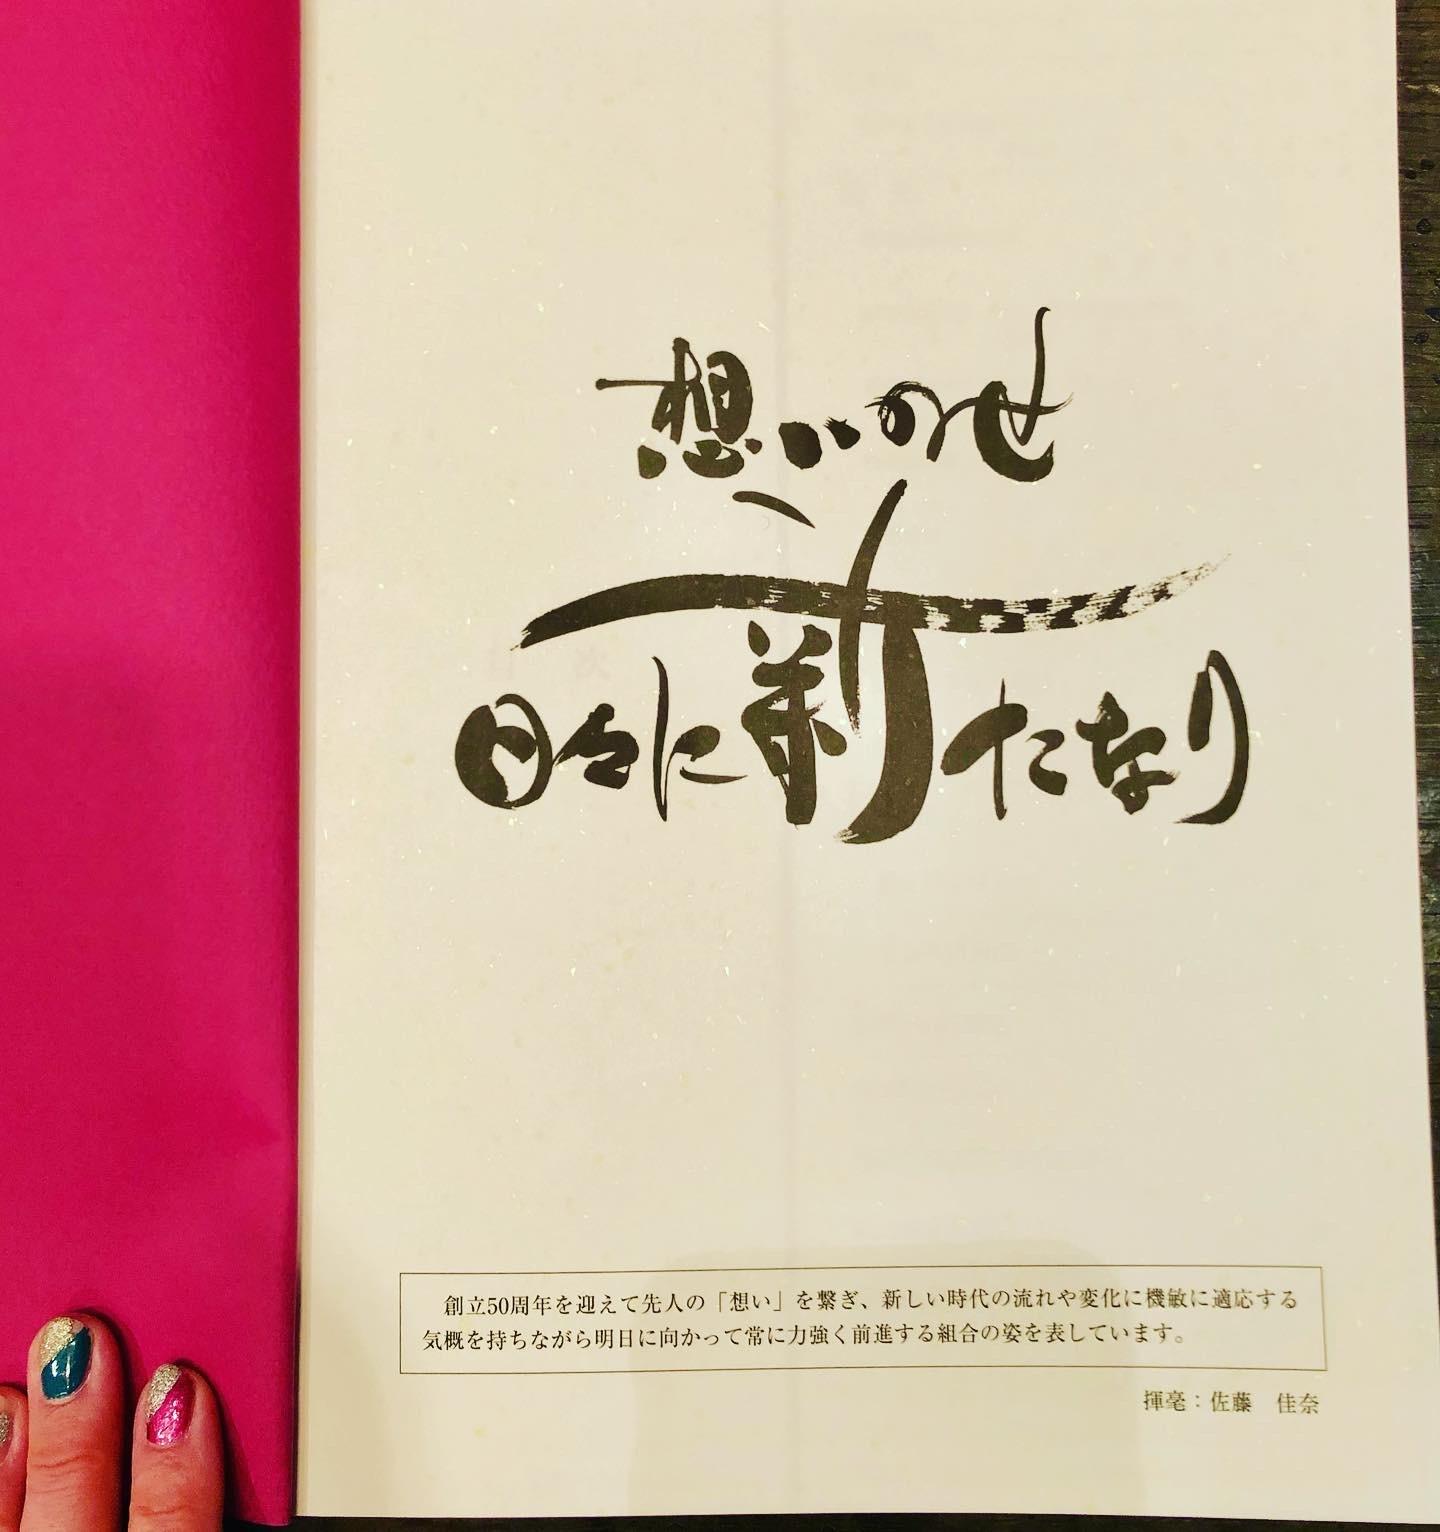 秋田卸センター様 創立50周年記念式典_e0197227_19214971.jpeg